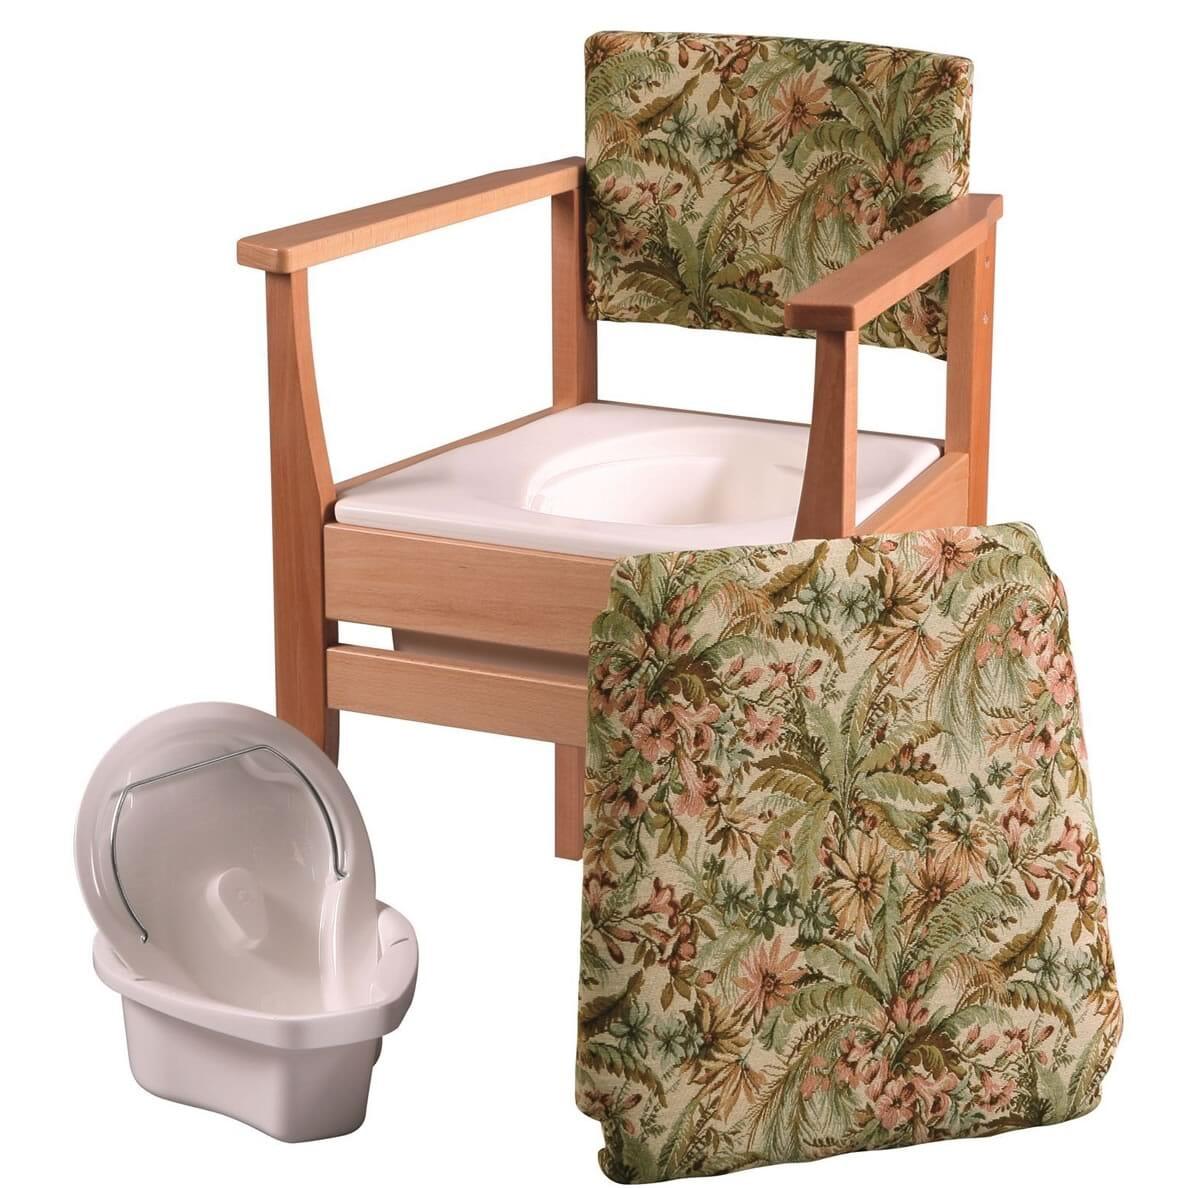 Chaise garde-robe - Motif tapisserie